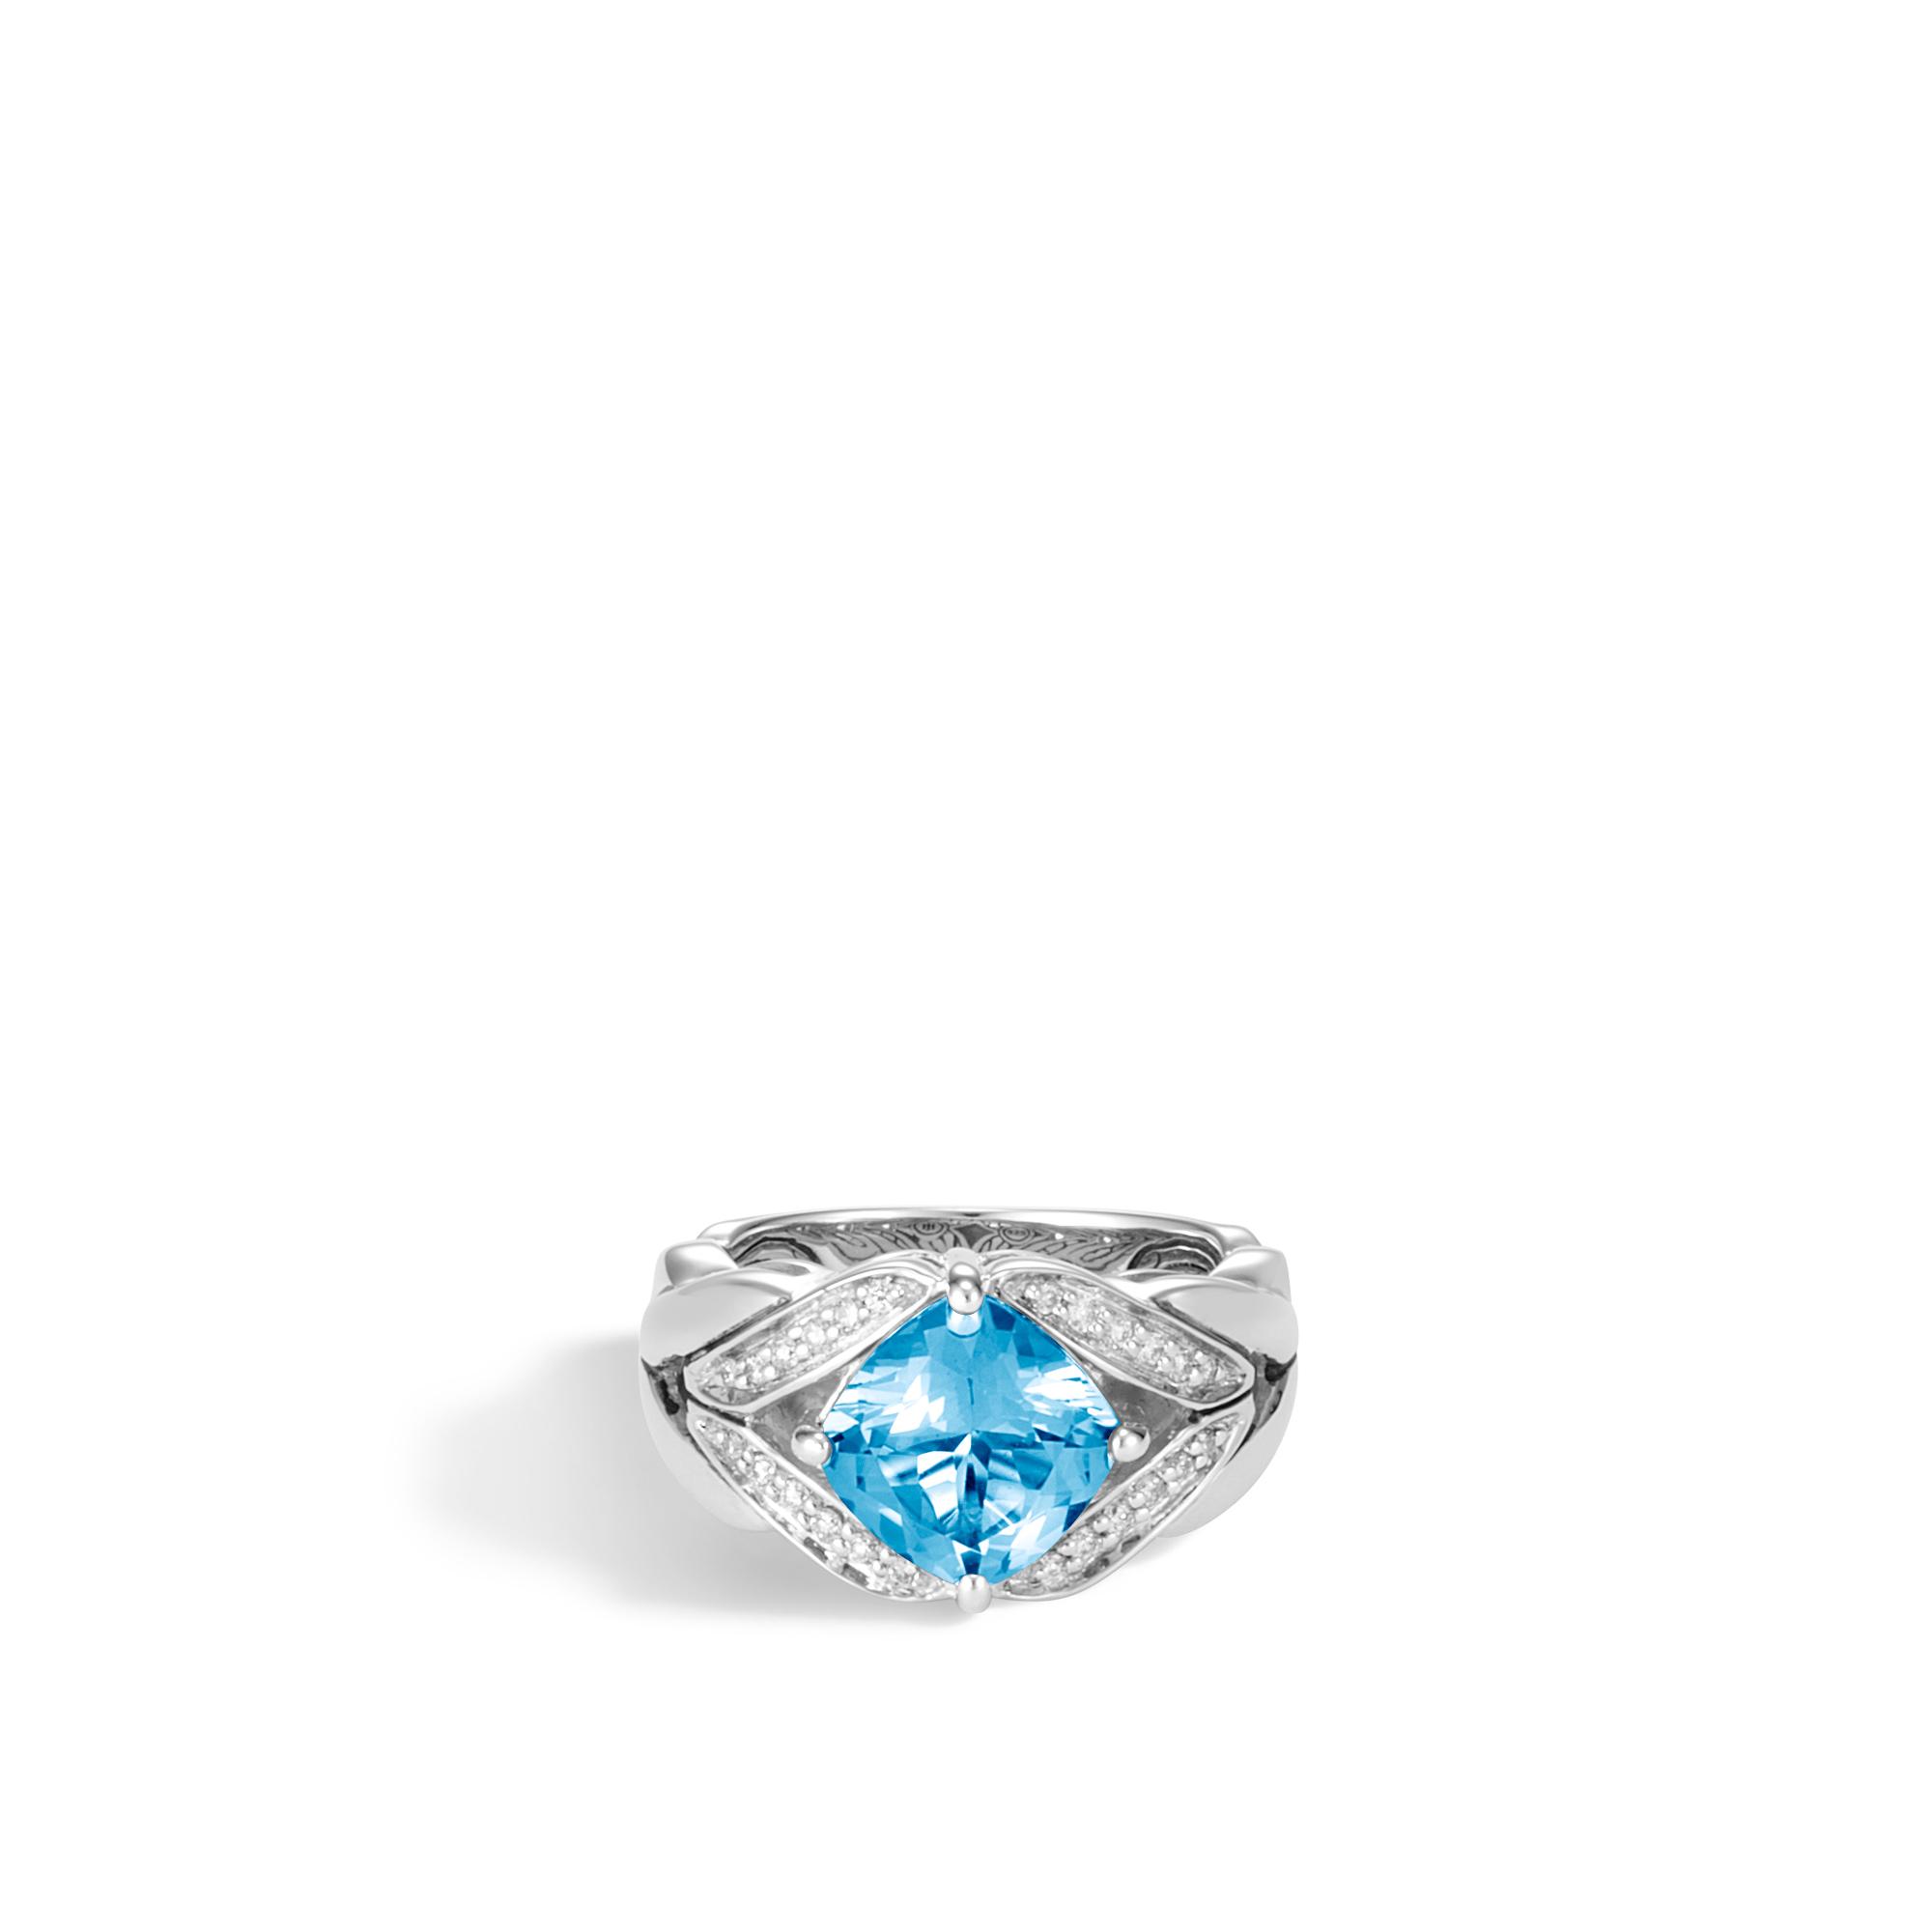 Modern Chain Magic Cut Ring, Silver, 9MM Gemstone, Diamonds, London Blue Topaz, large